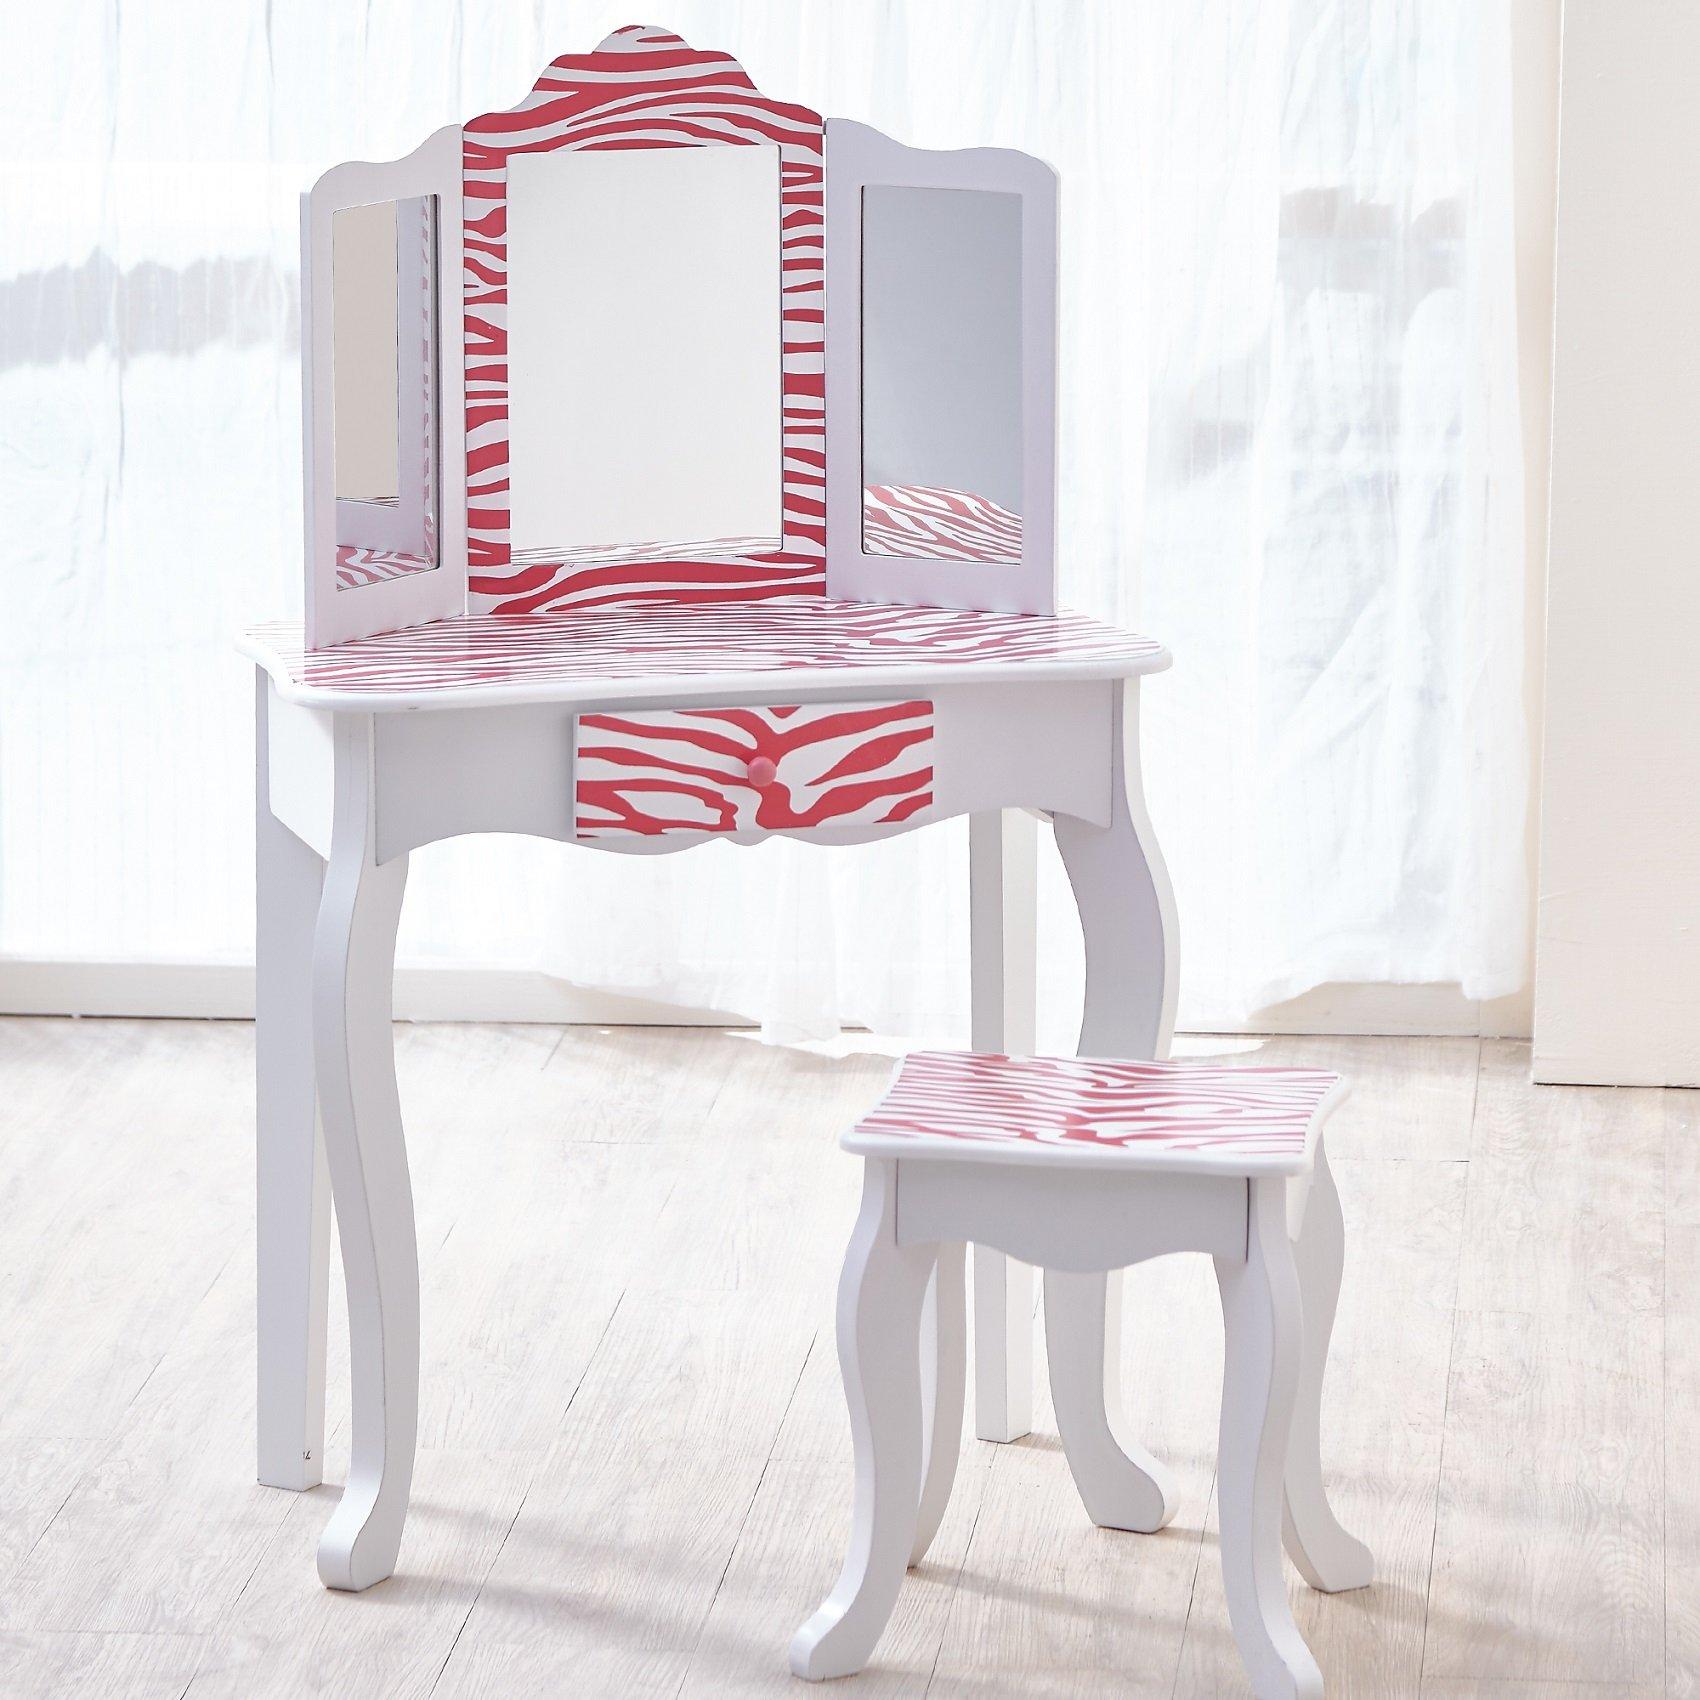 Teamson Kids - Fashion Prints Girls Vanity Table and Stool Set with Mirror - Zebra (Pink / White)